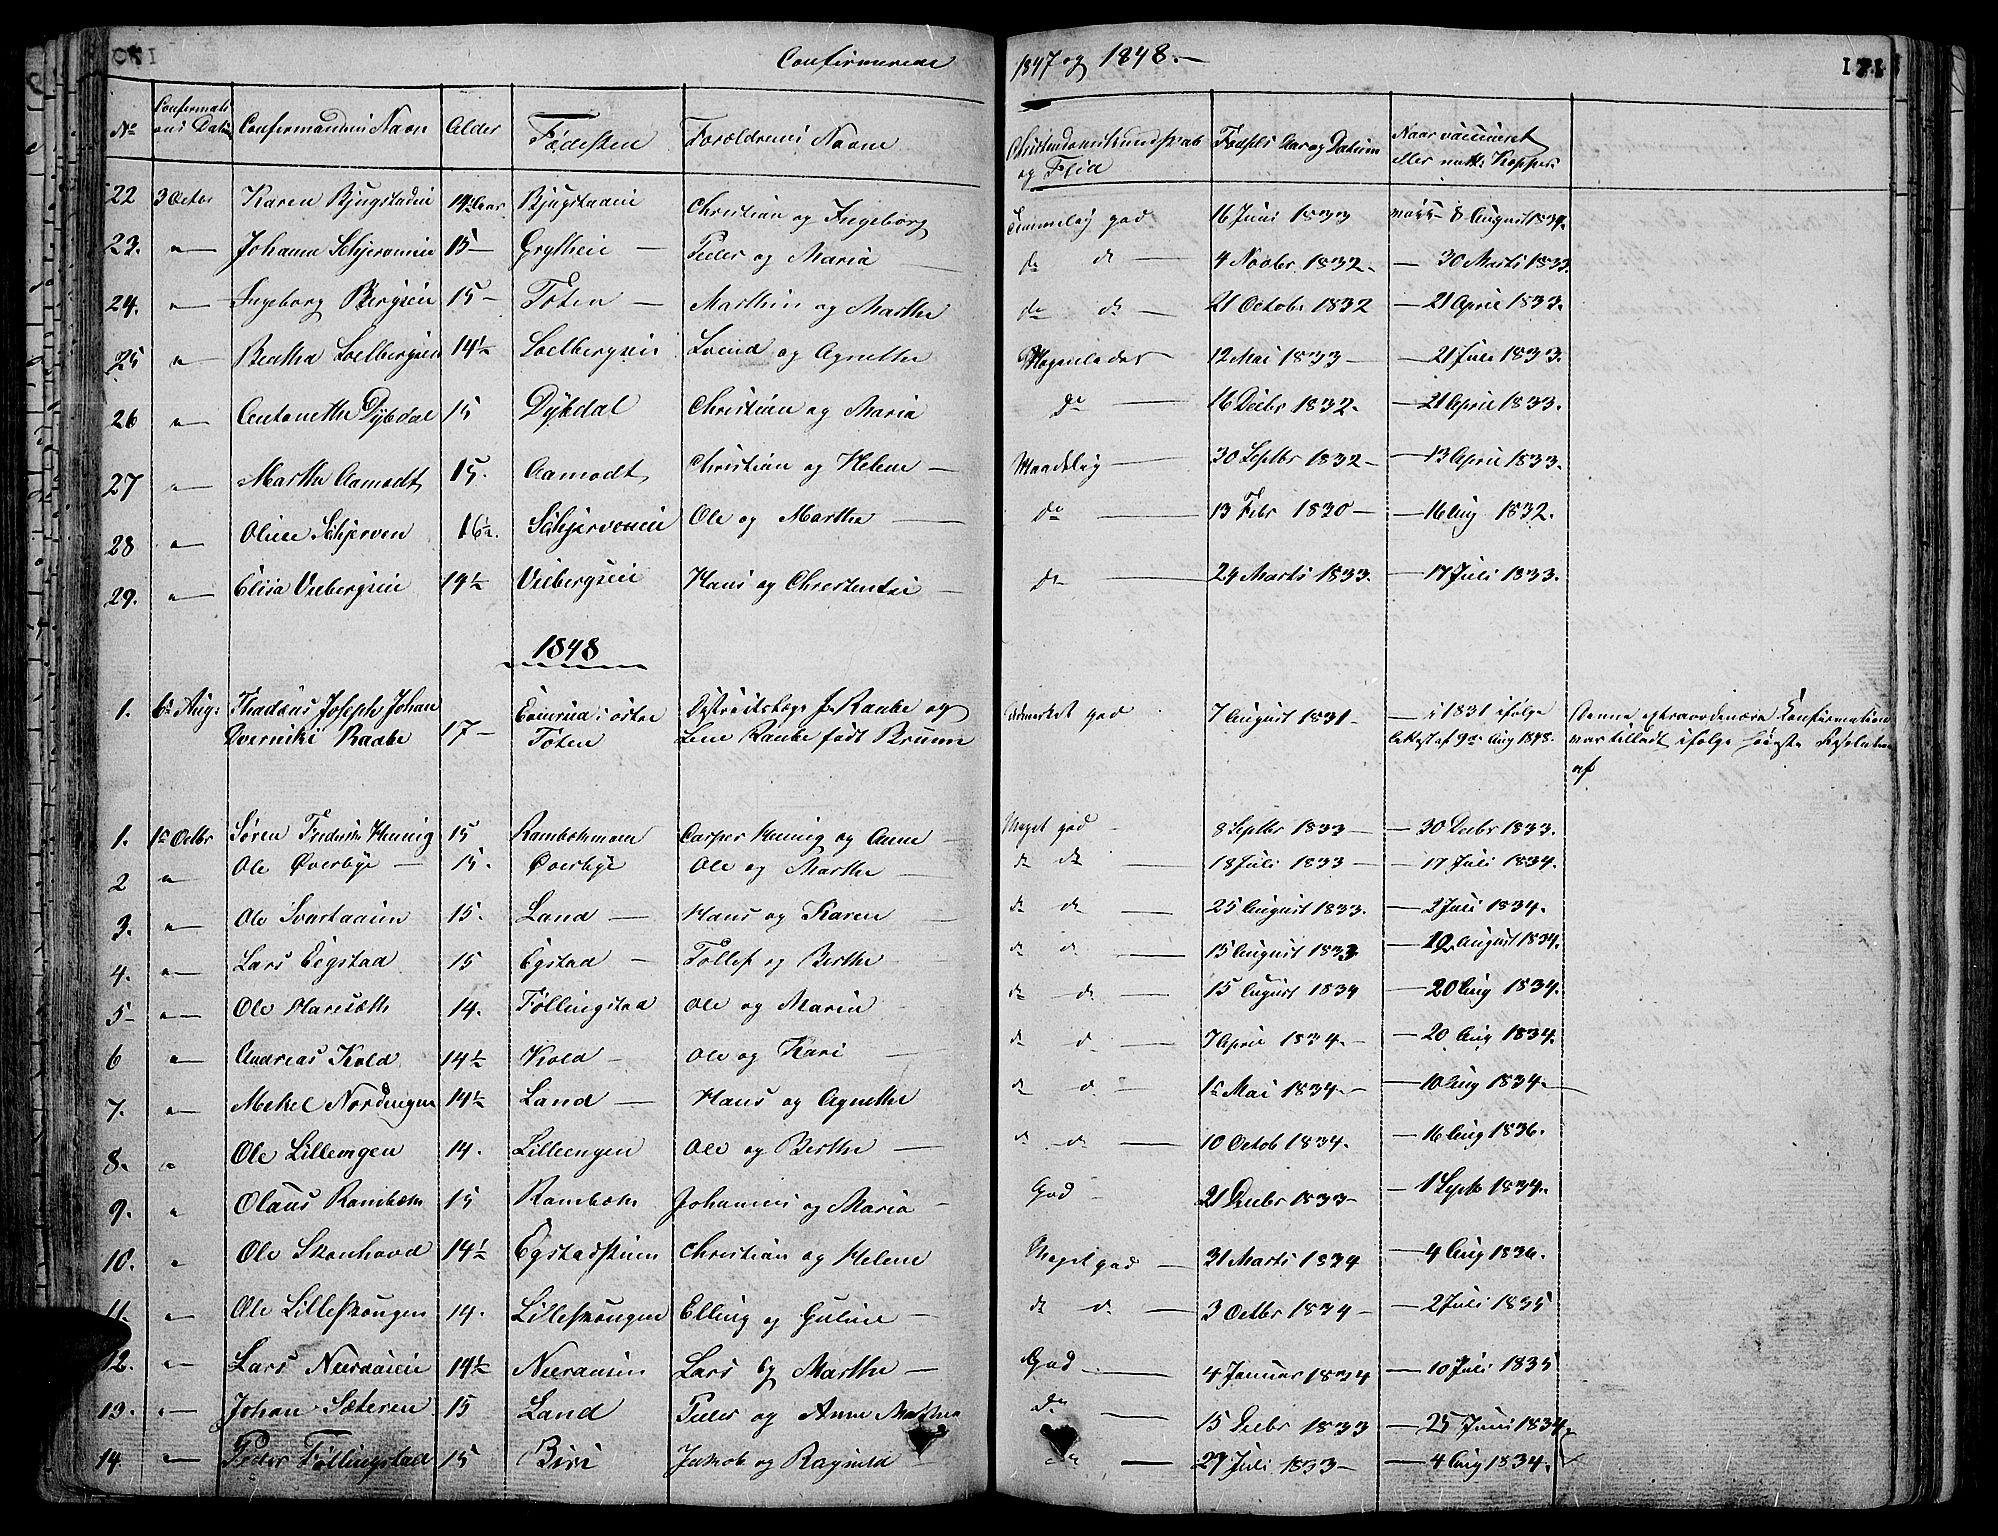 SAH, Vardal prestekontor, H/Ha/Hab/L0004: Klokkerbok nr. 4, 1831-1853, s. 171